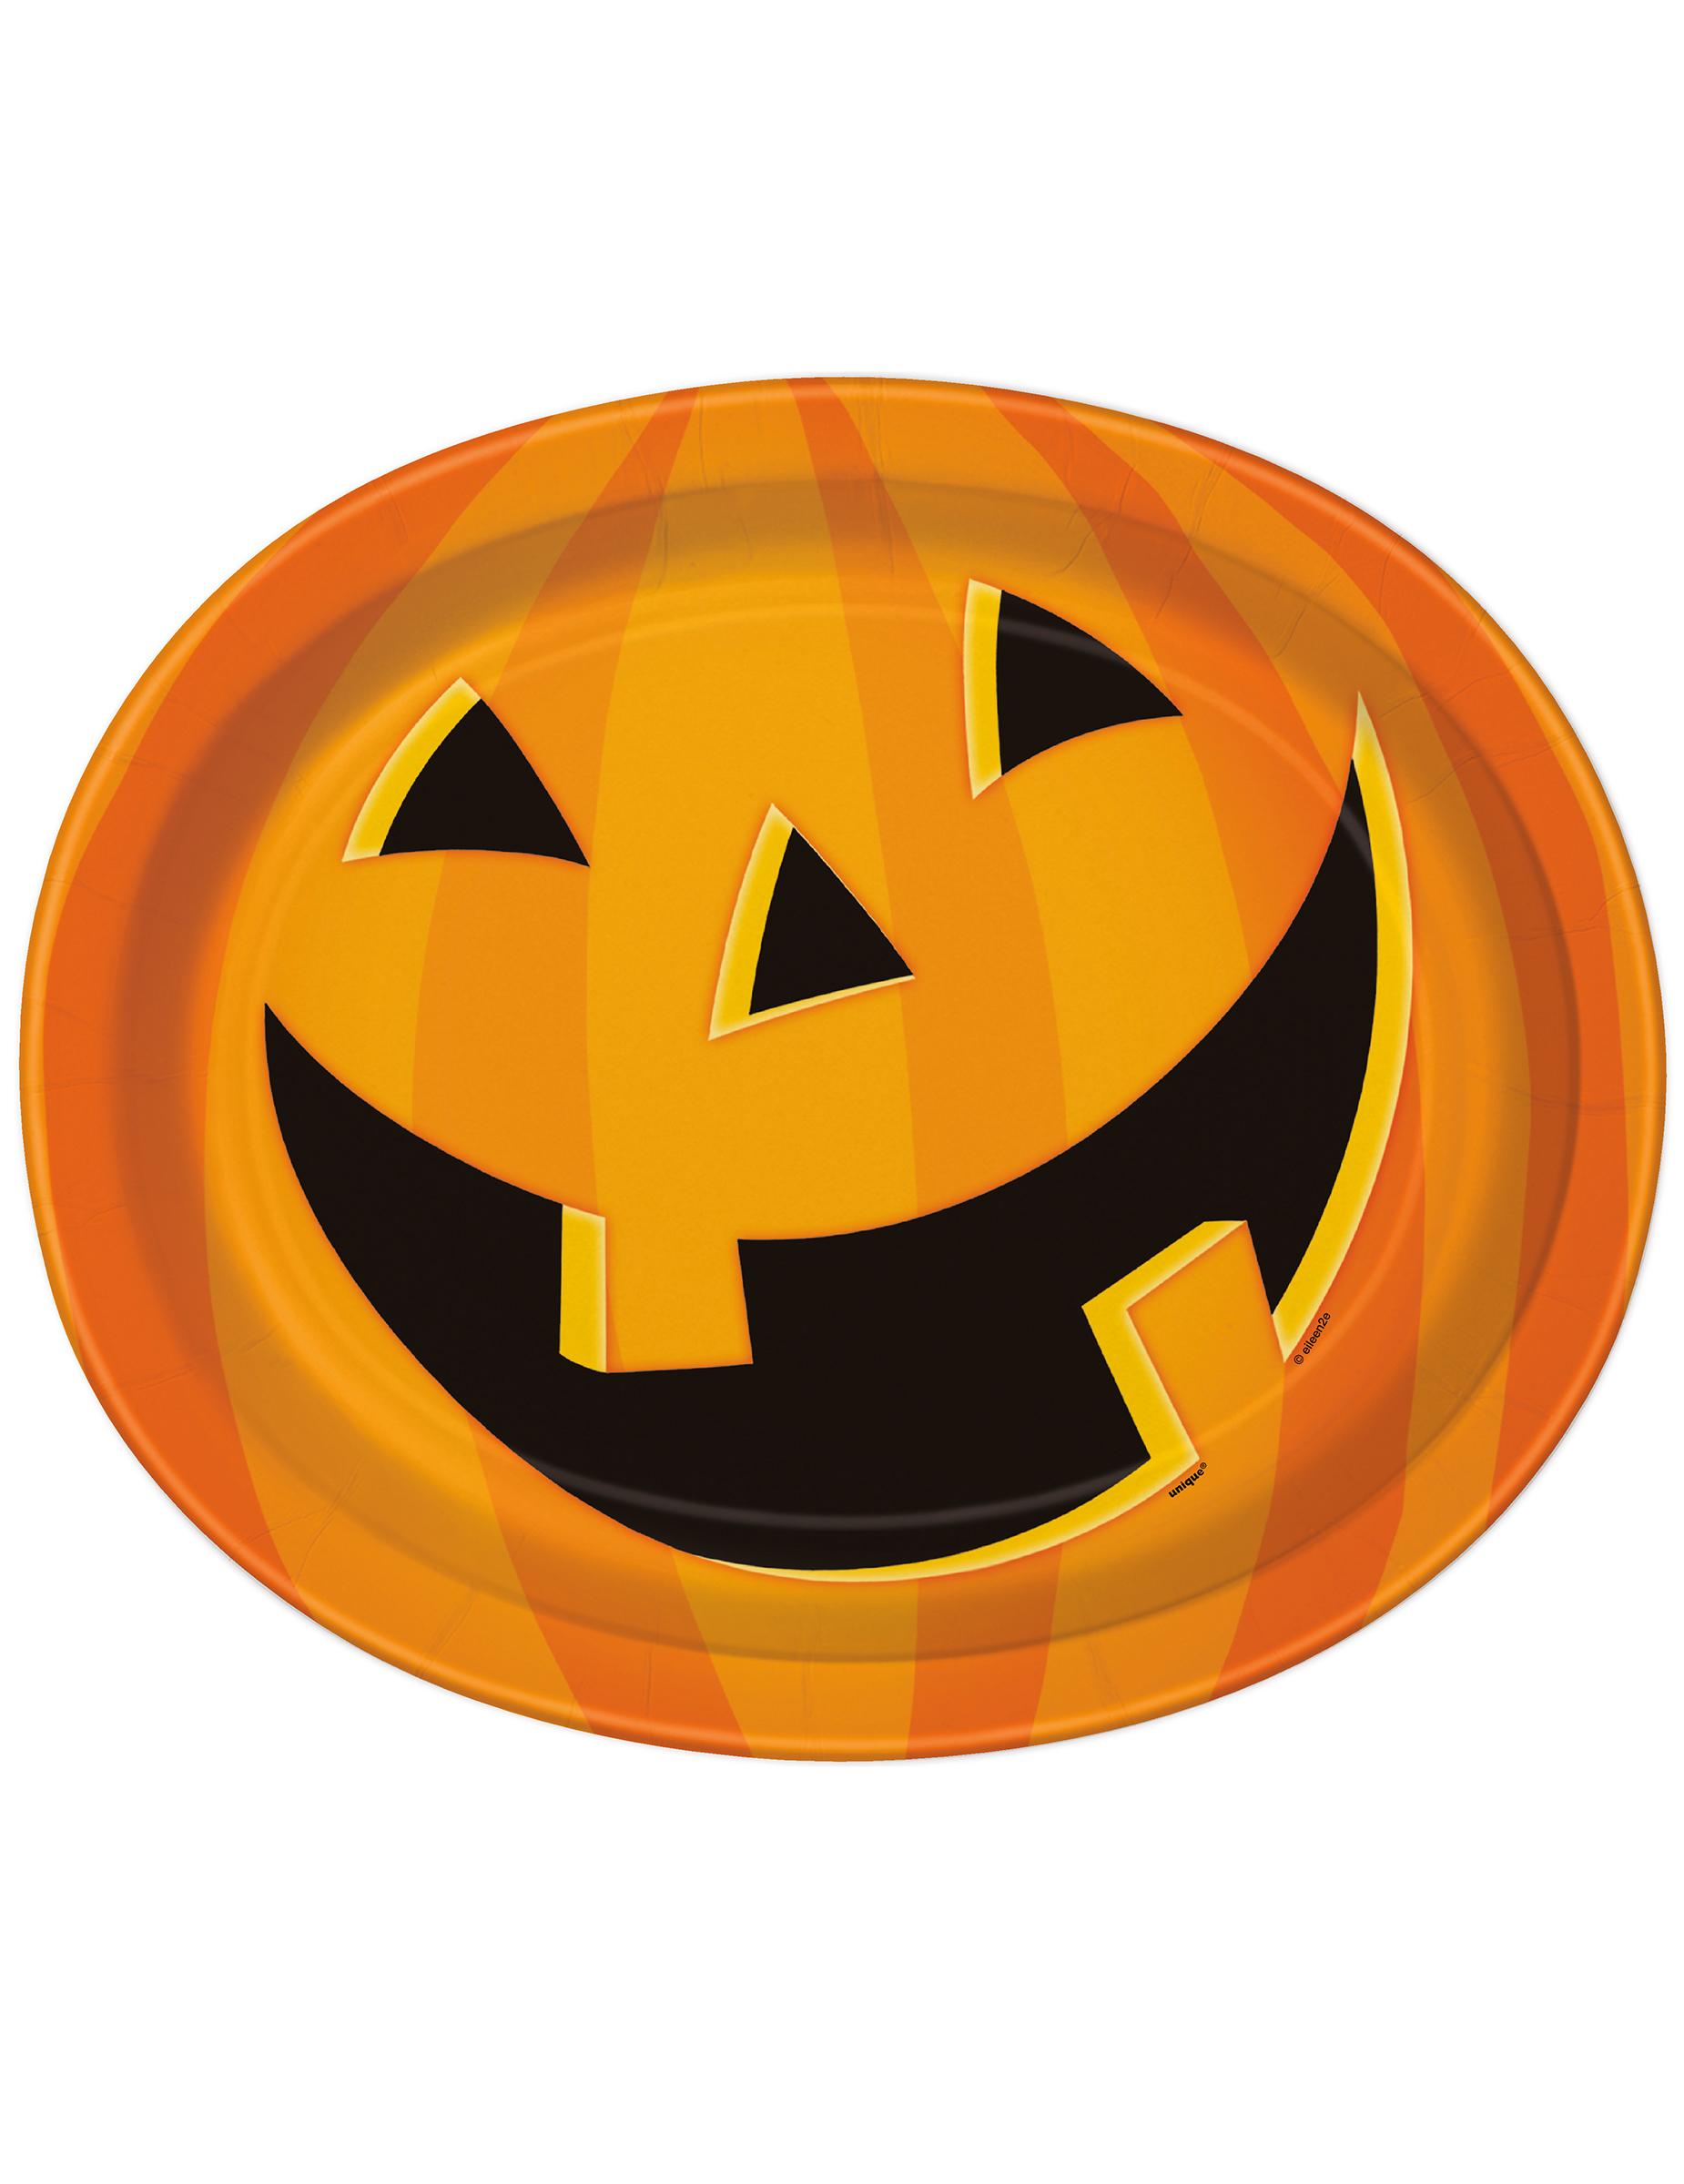 K rbis servierplatten halloween tischdeko 8 st ck orange schwarz 30x25cm g nstige faschings - Tischdeko kurbis ...